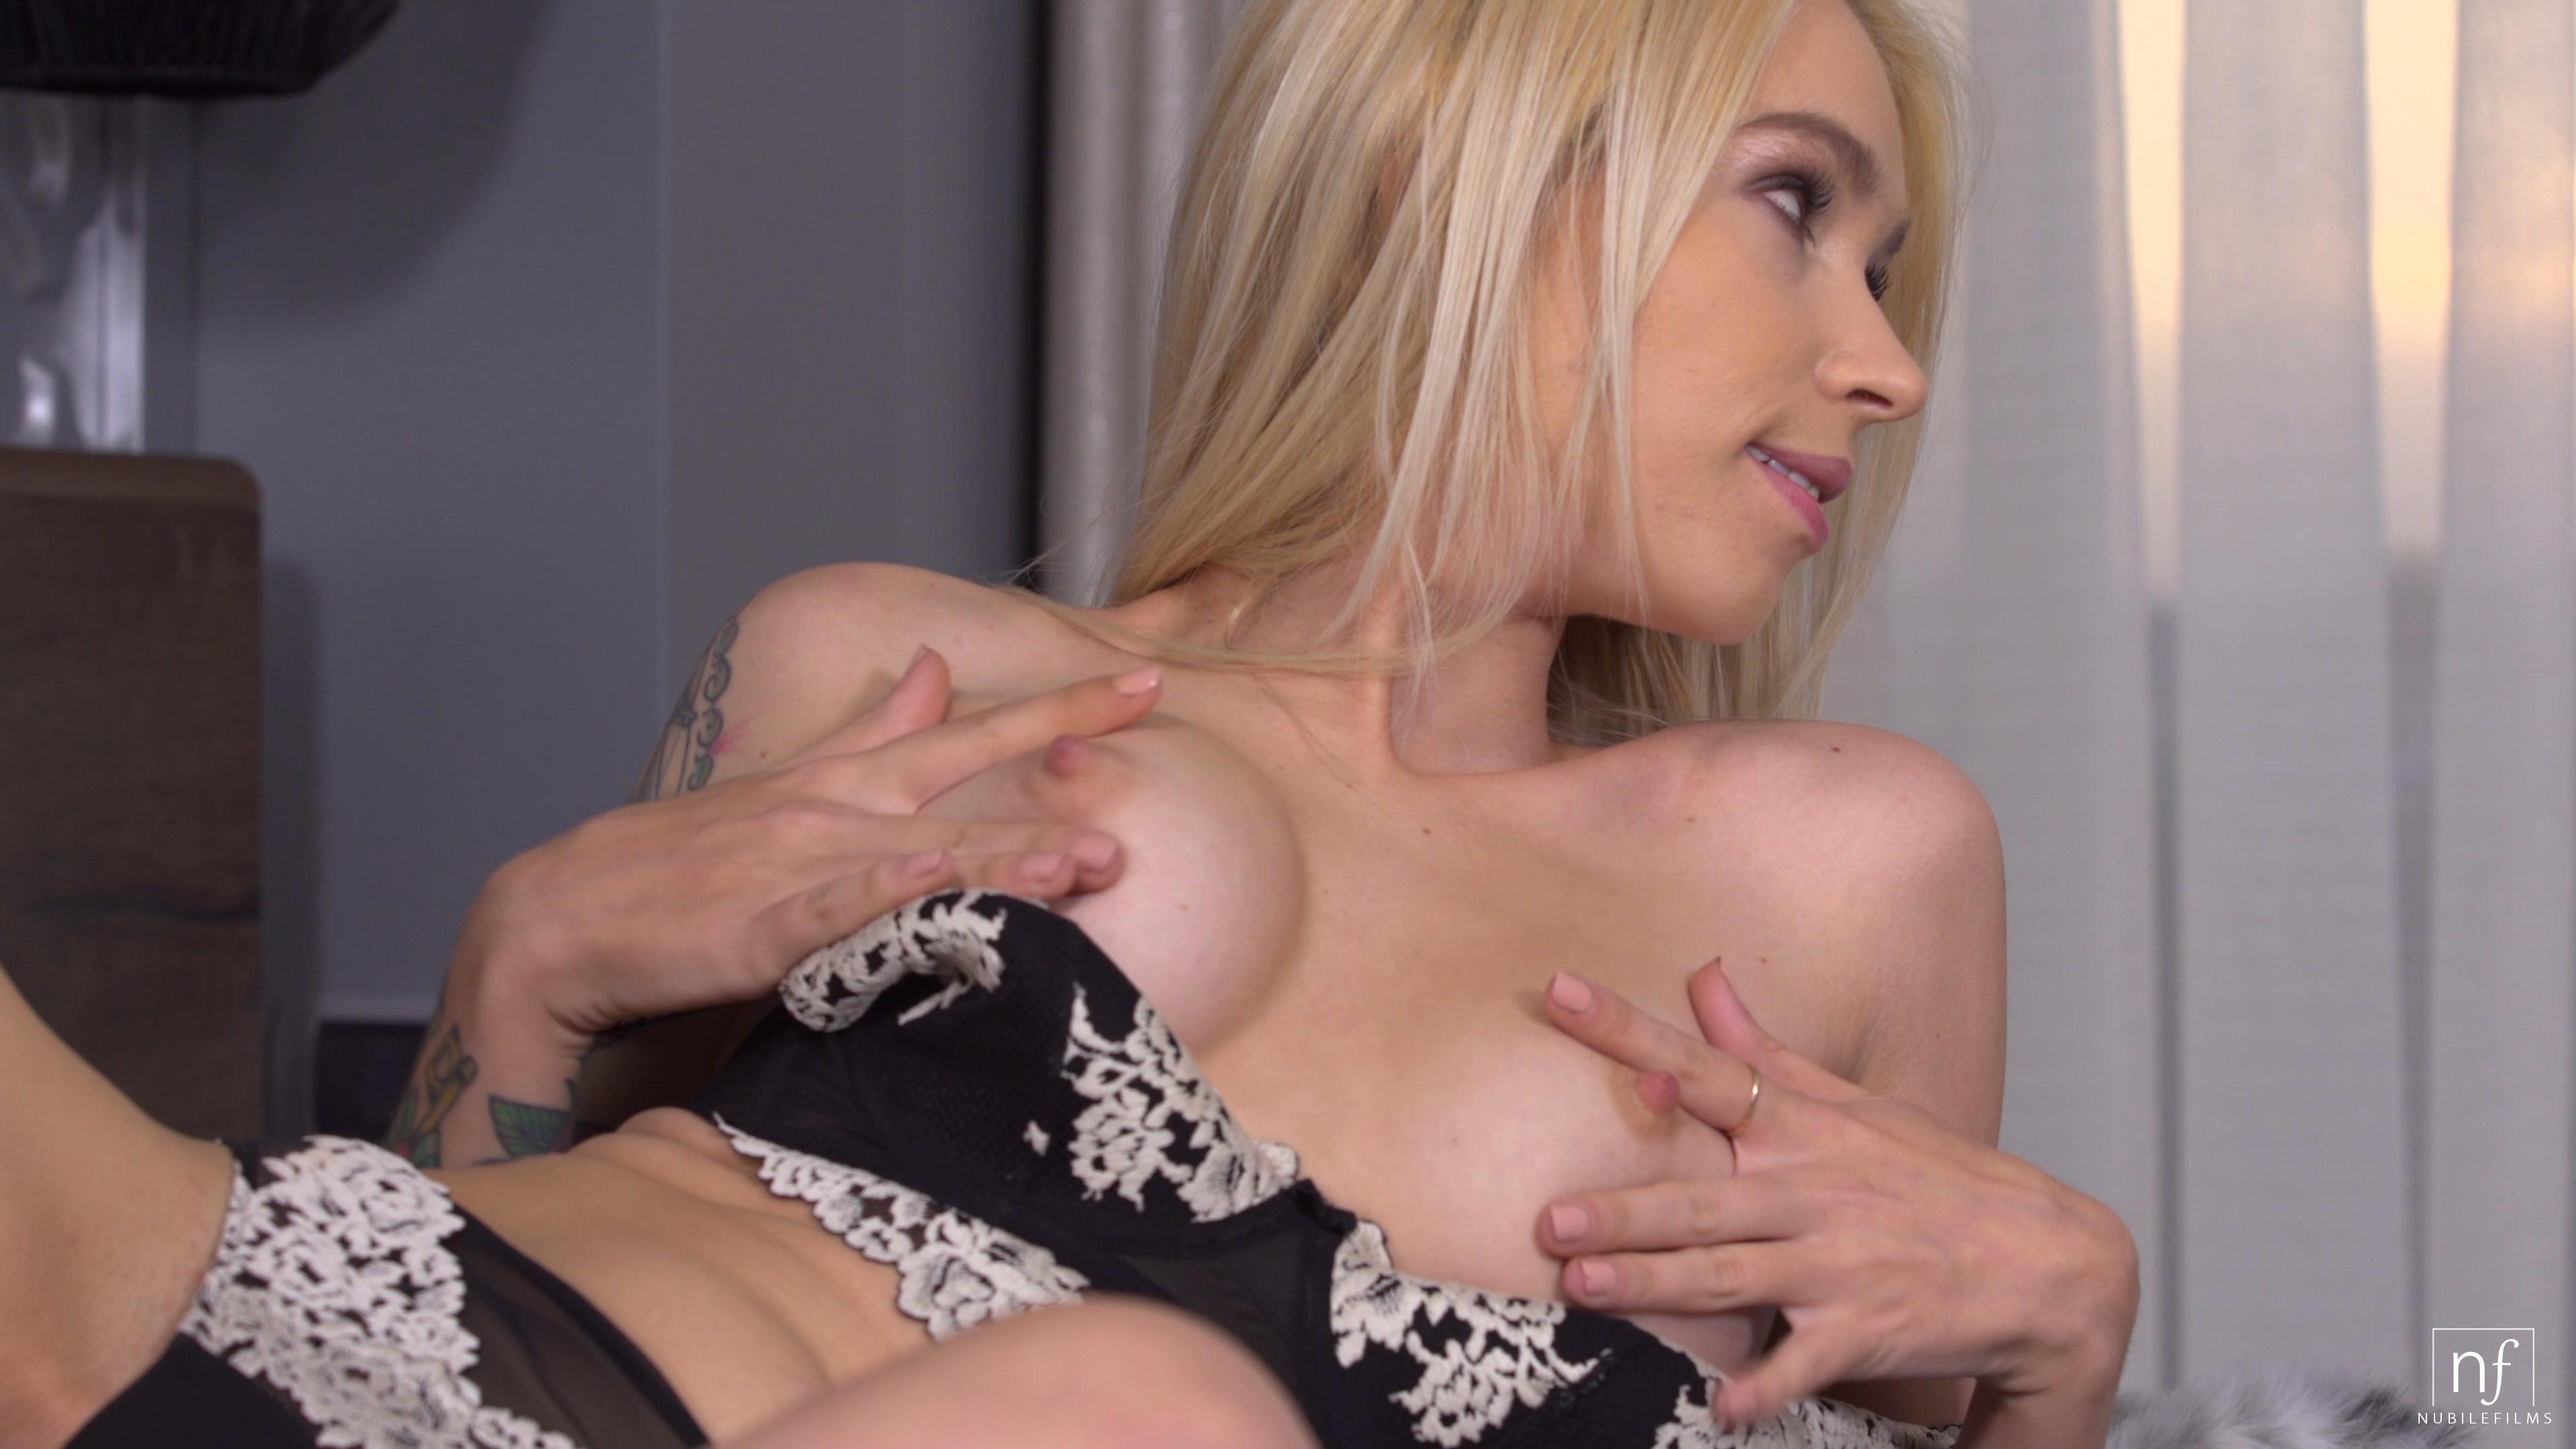 NubileFilms.com - Amaris,Arteya: Lesbian Foreplay - S31:E2